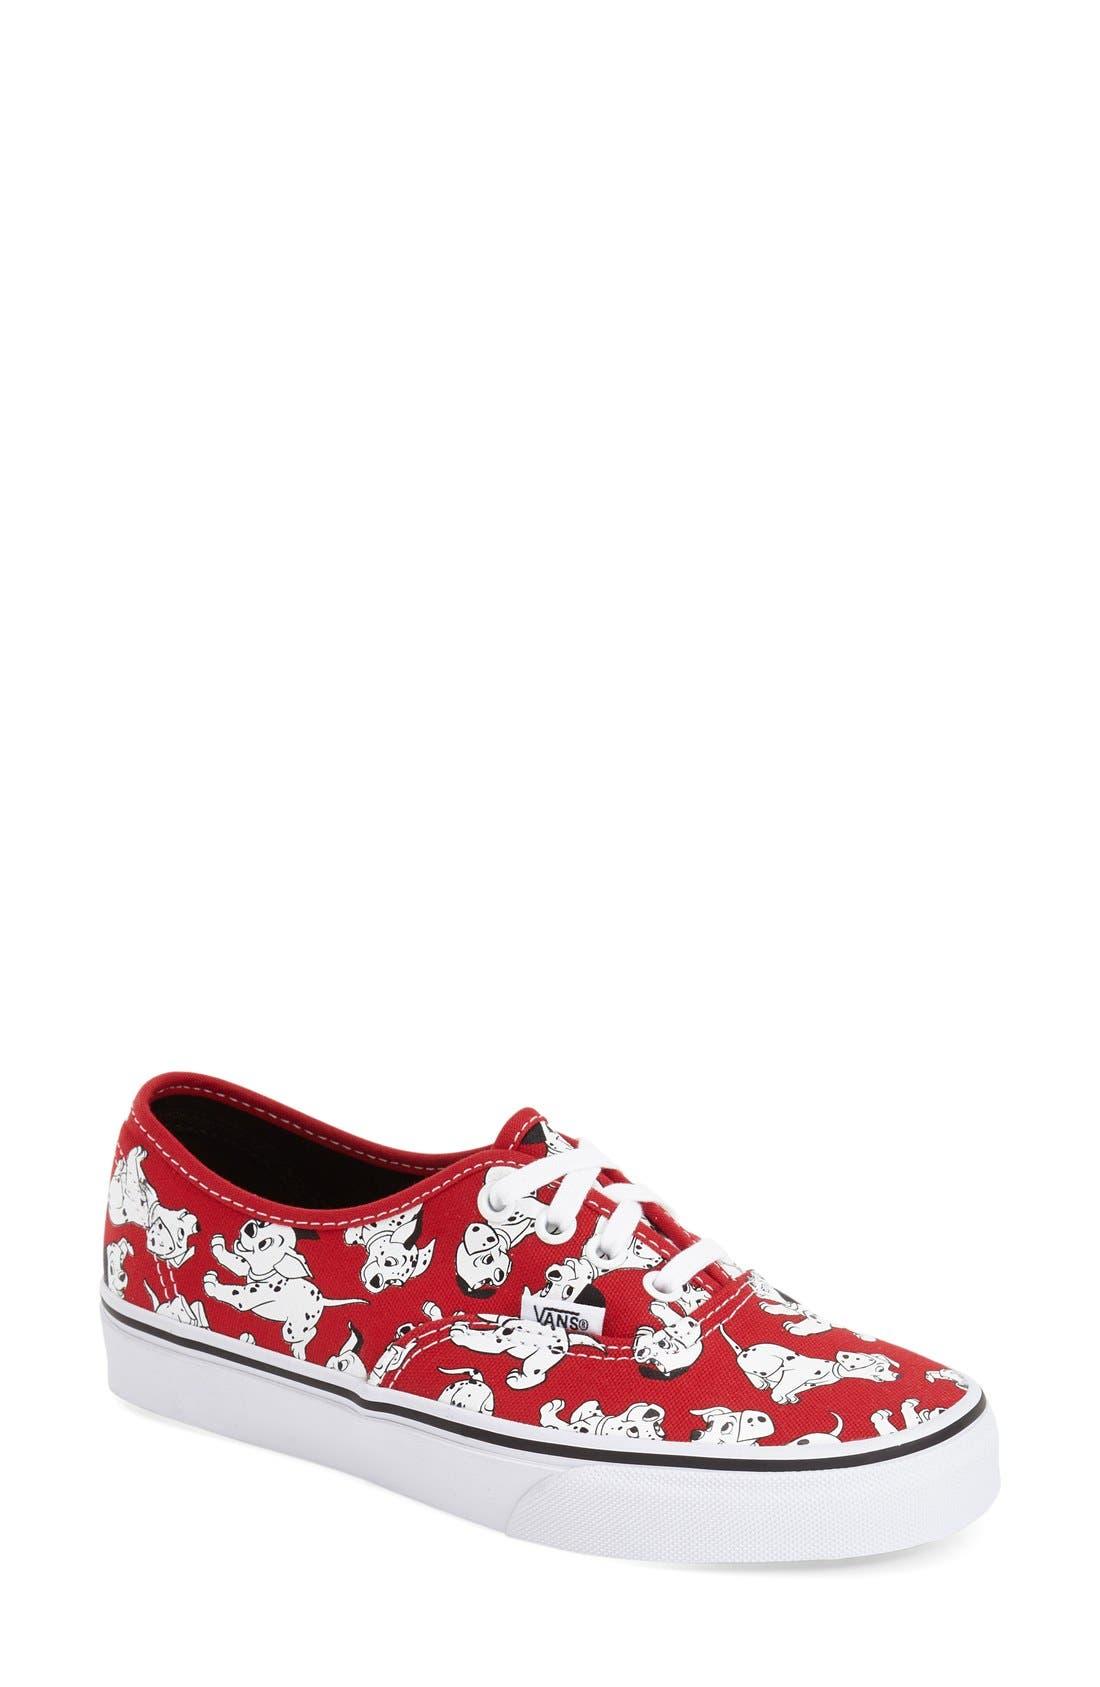 Alternate Image 1 Selected - Vans 'Authentic - Disney® 101 Dalmatians®' Sneaker (Women)